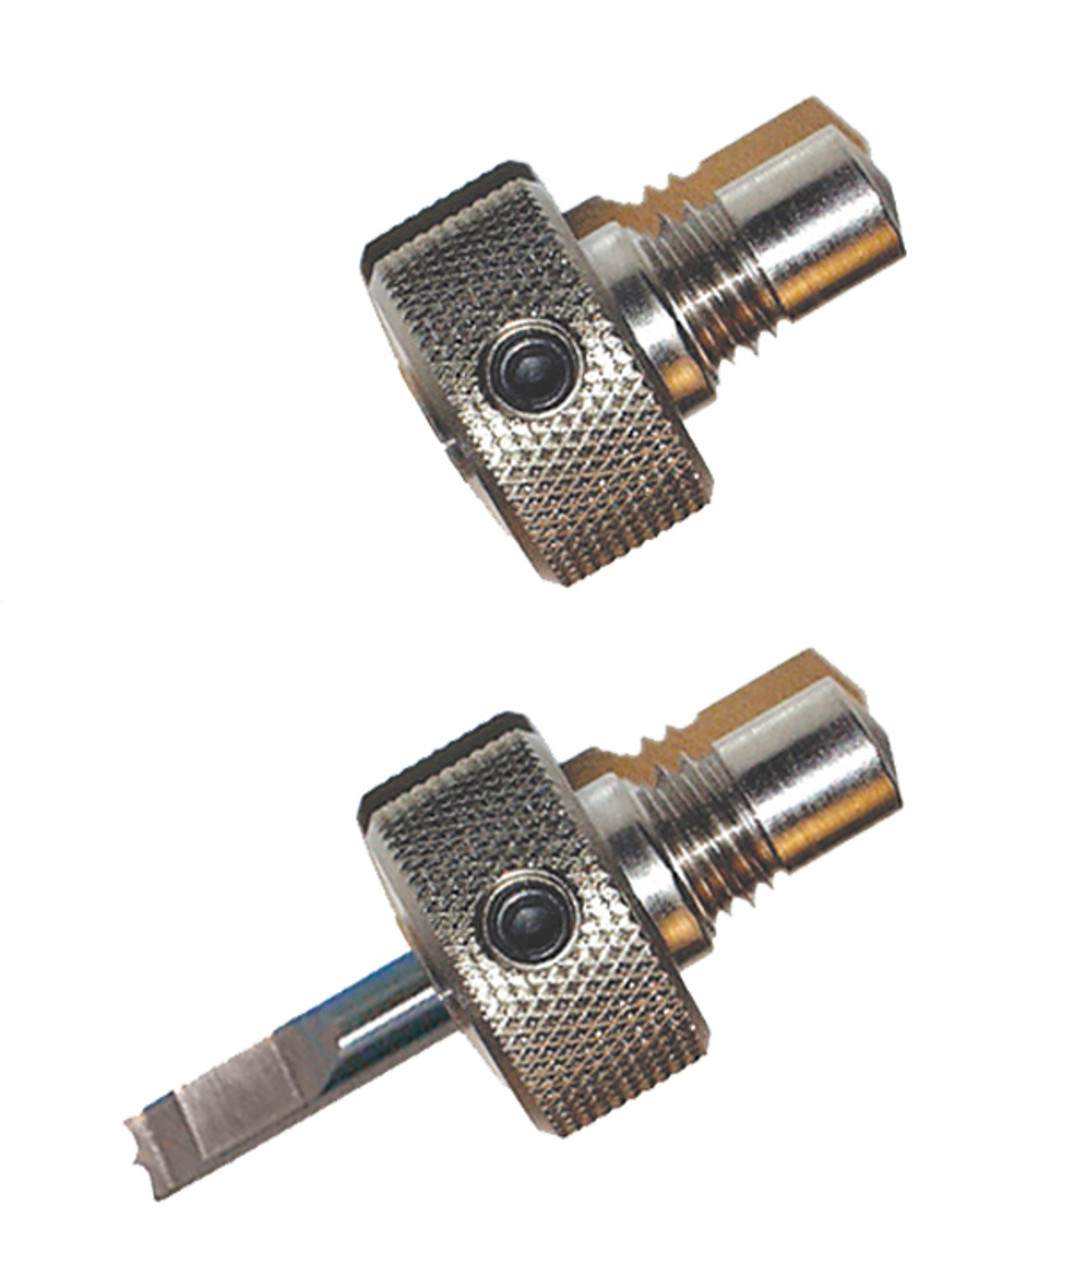 C30011 - LB-30/30 Express Bit Holder w/ Set Screw